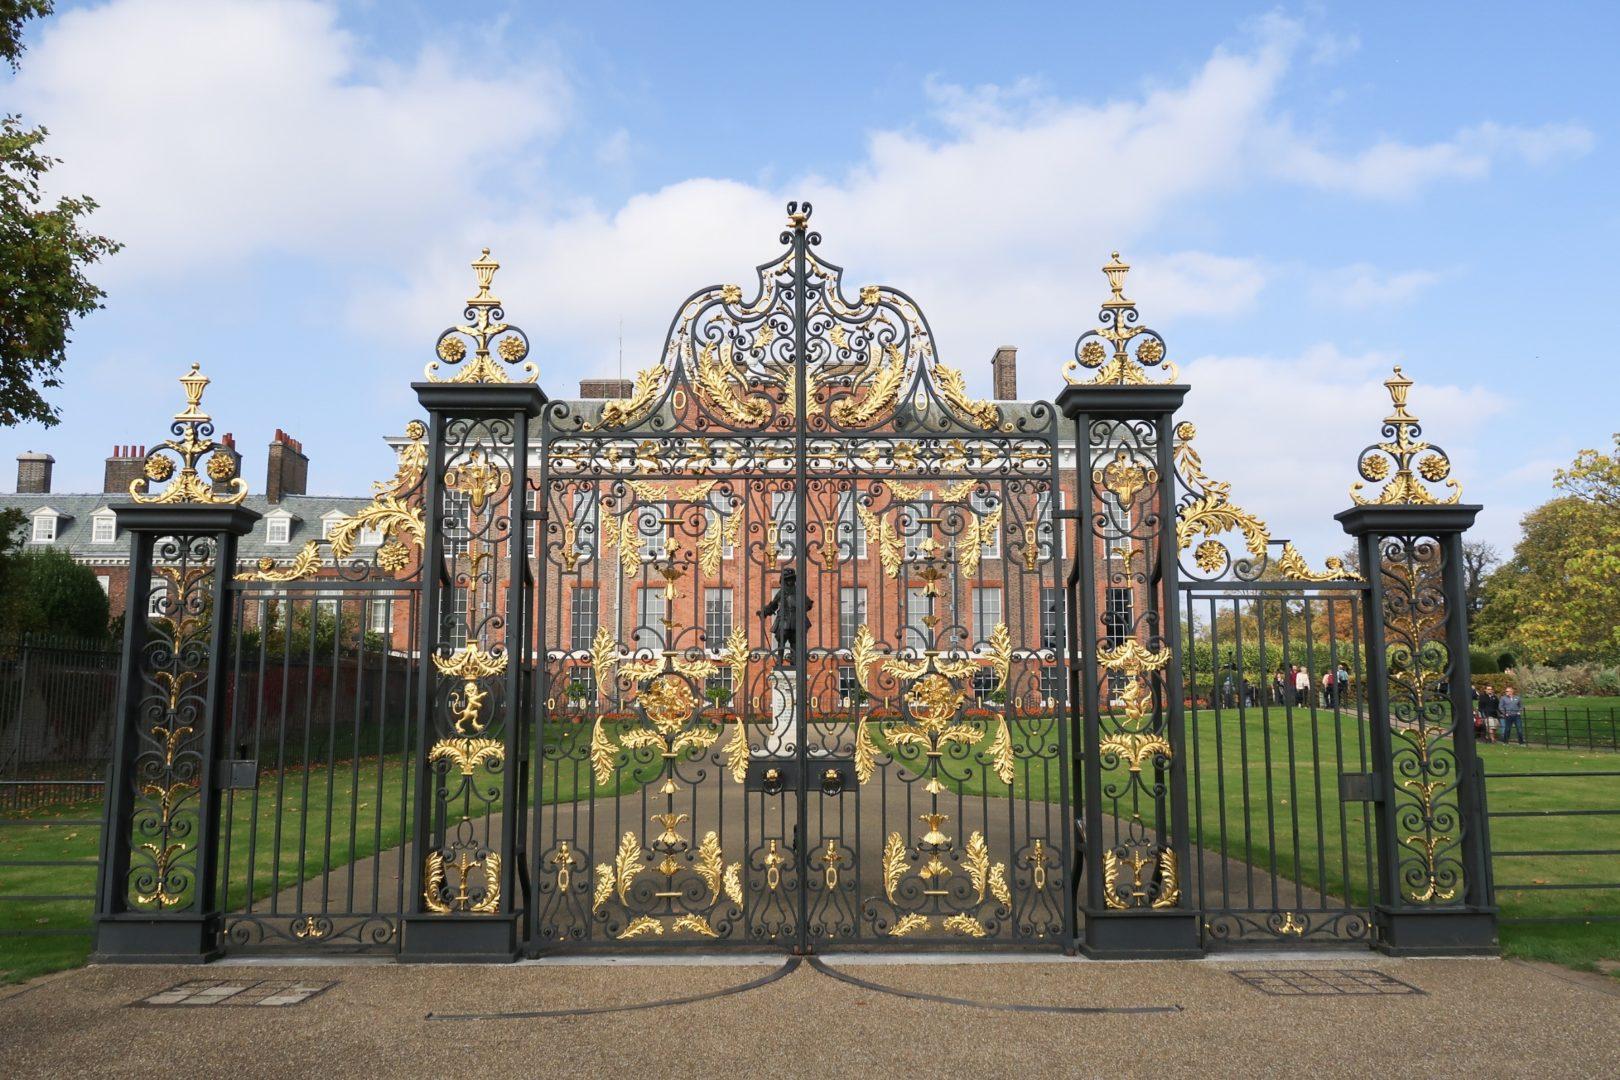 Kensington London - Kensignton Palace